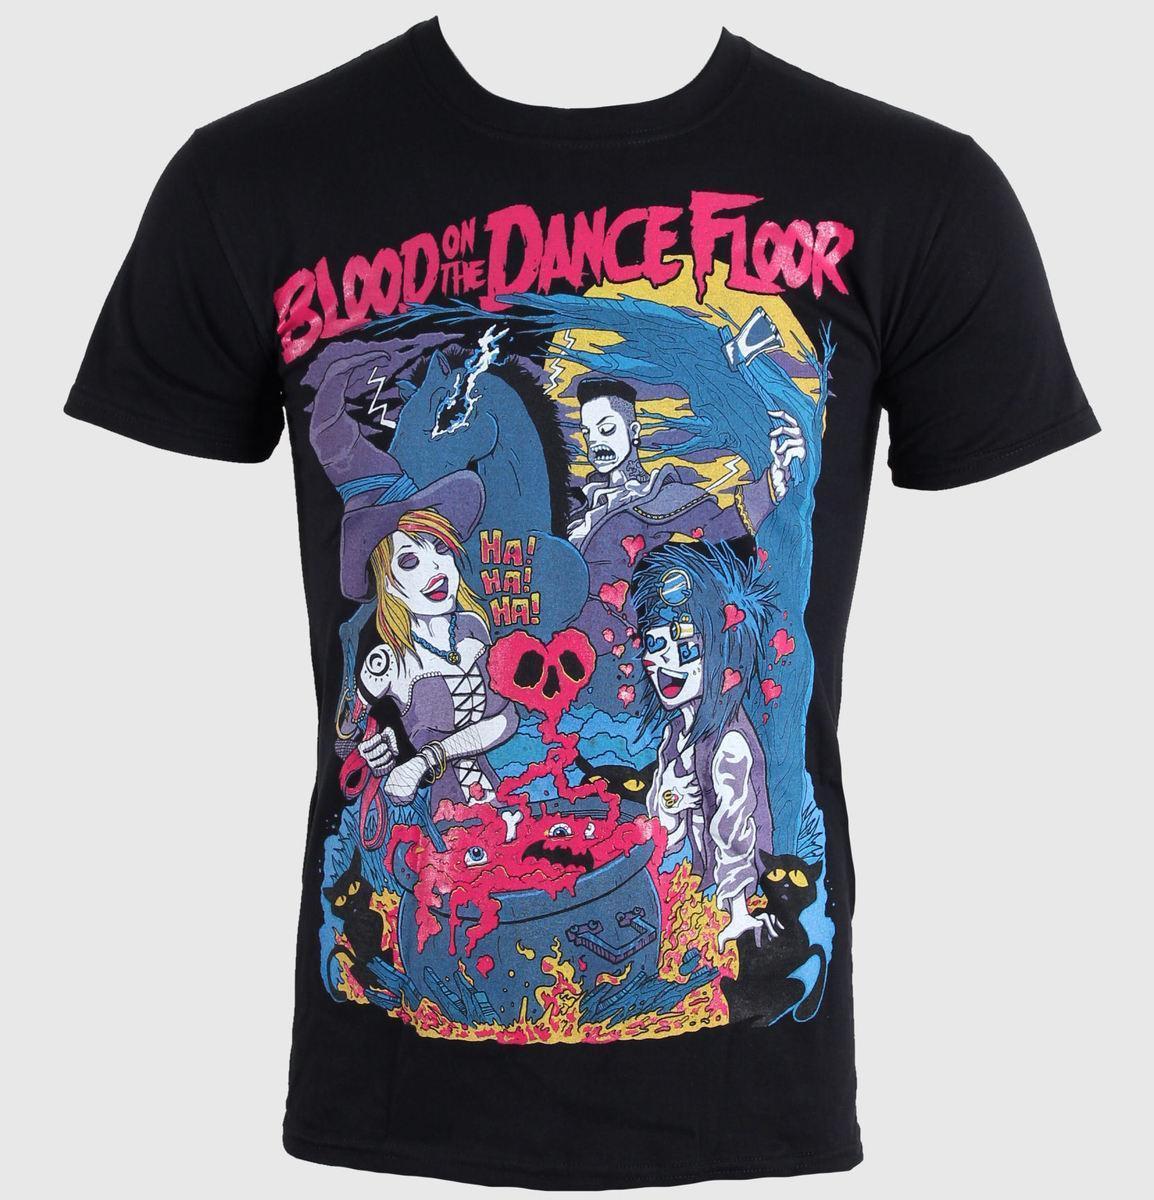 Herren T Shirt Blood On The Dance Floor Magic Live Nation Grosse Xxl Coolest T Shirt Shirts With Designs From Linnan04 14 67 Dhgate Com